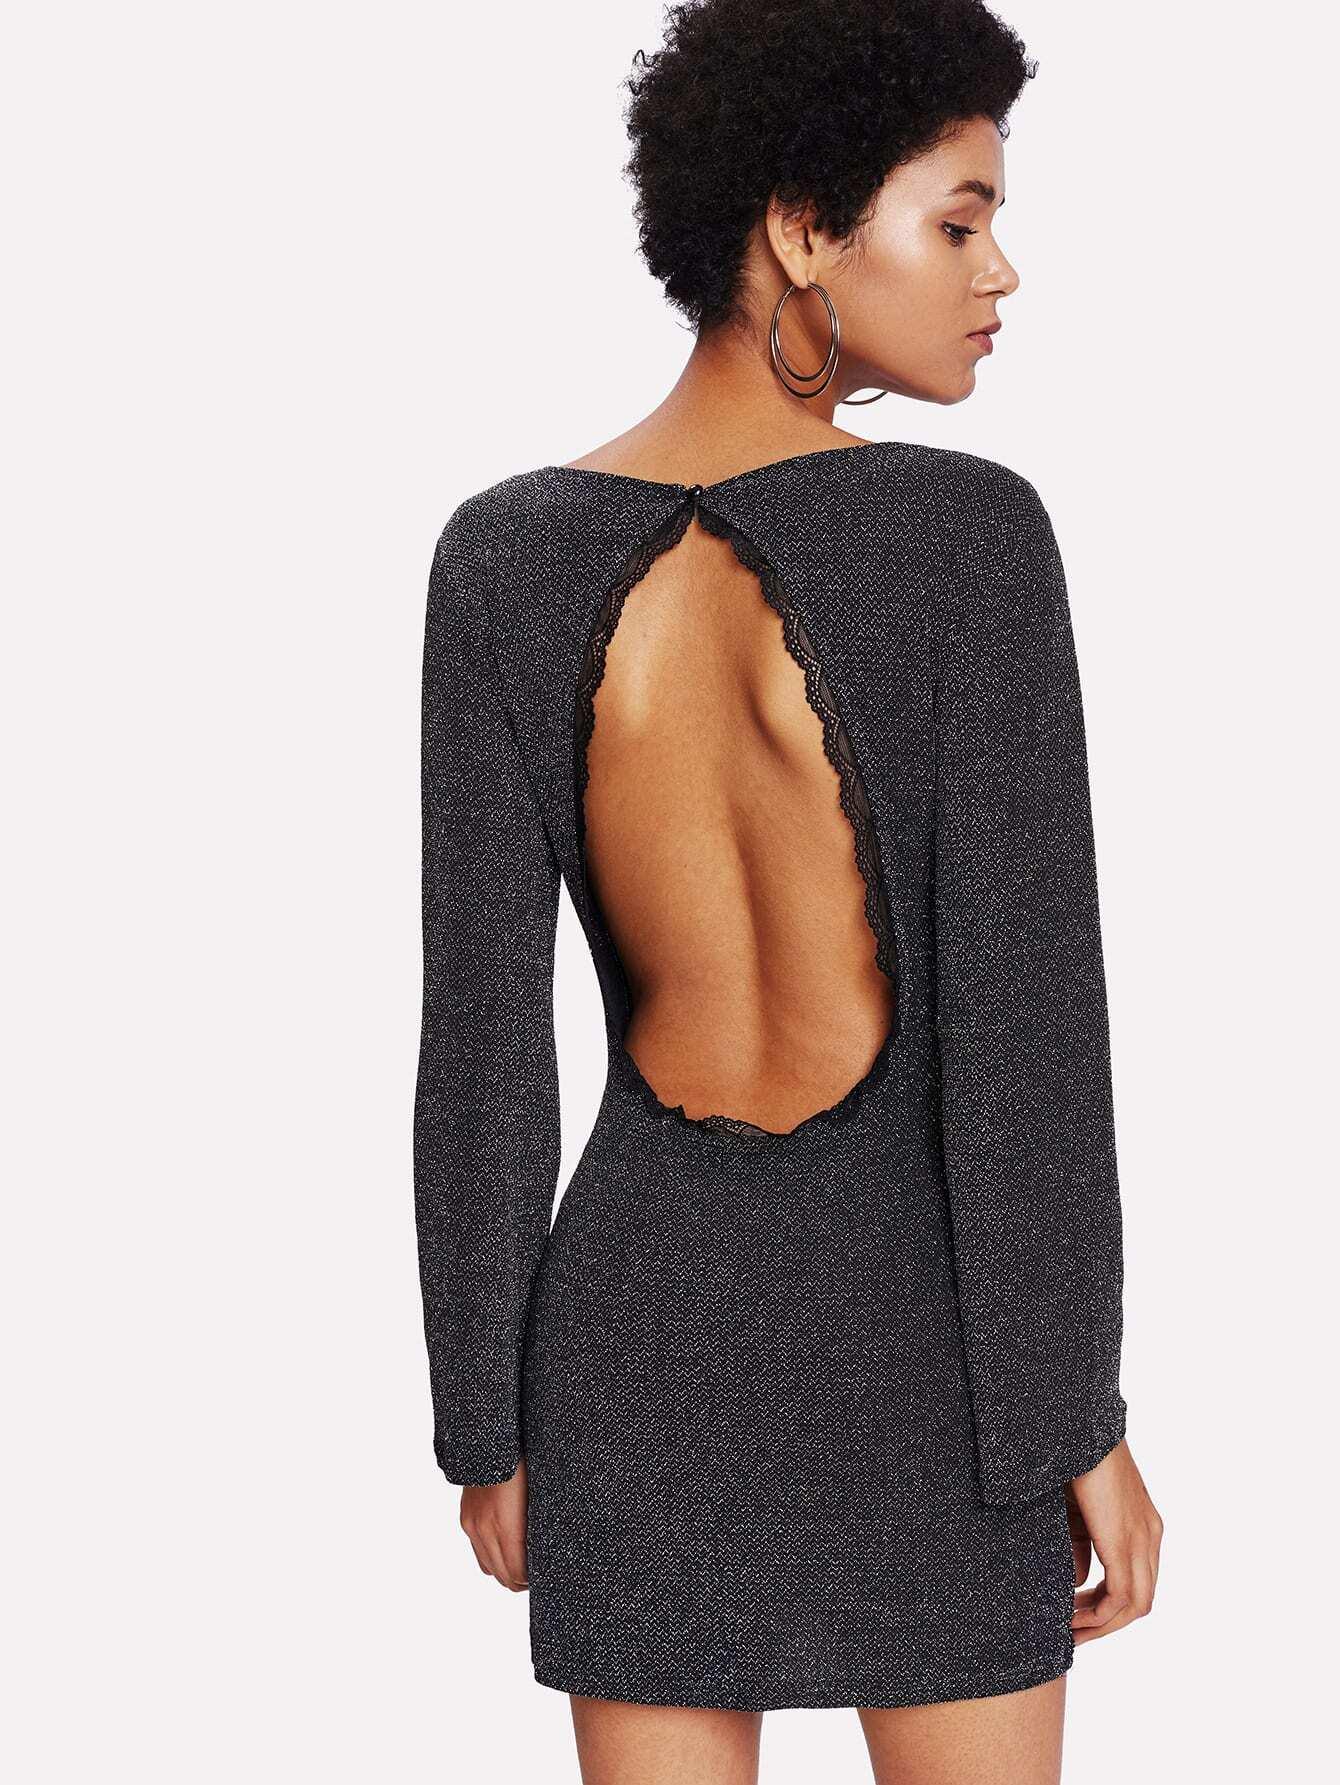 Lace Trim Open Back Dress lace yoke frill trim open back dress